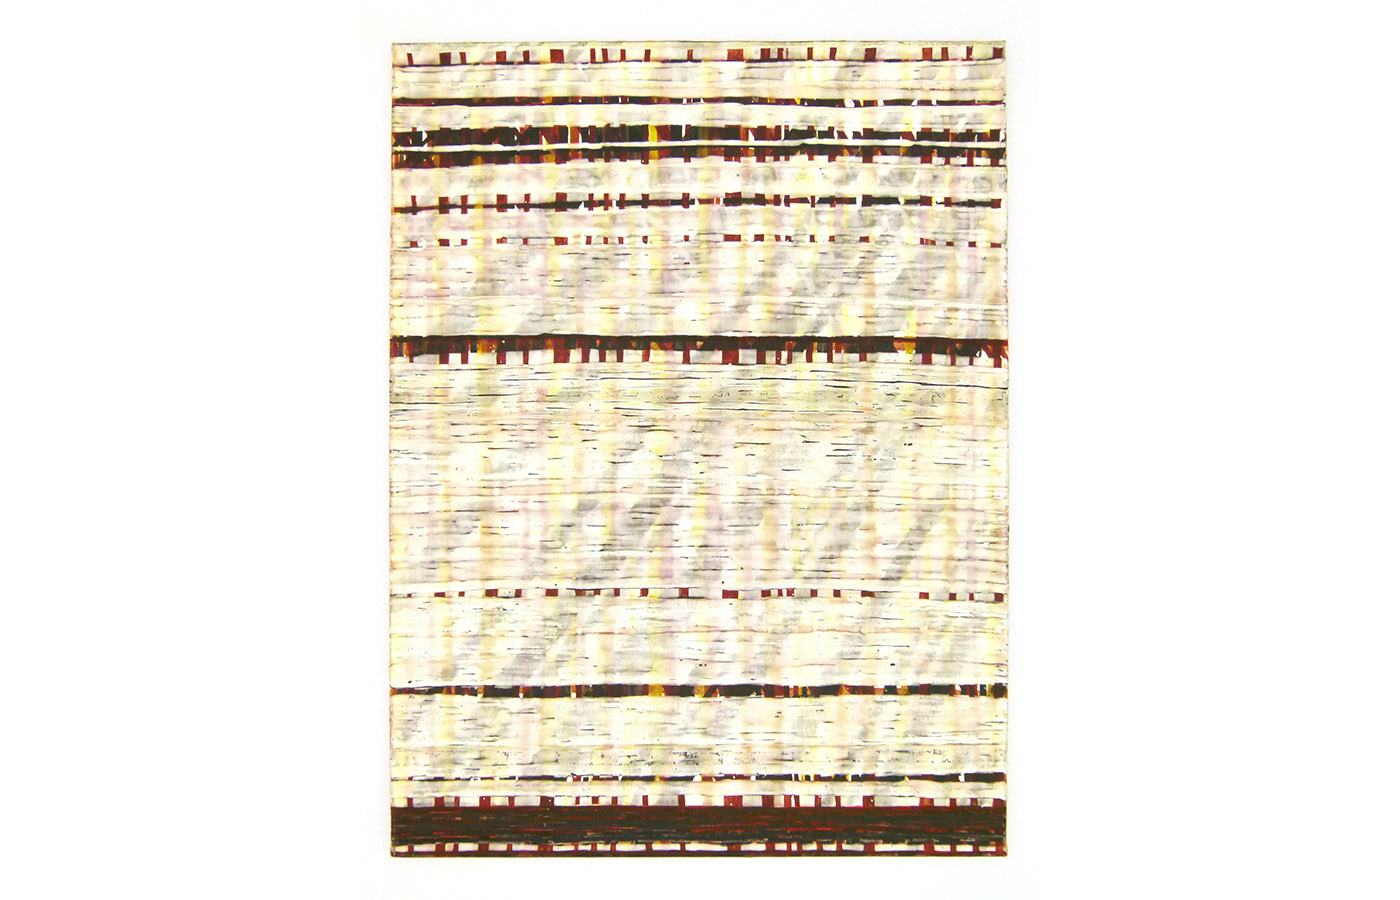 Linienbilder 4_0000_L1150015a